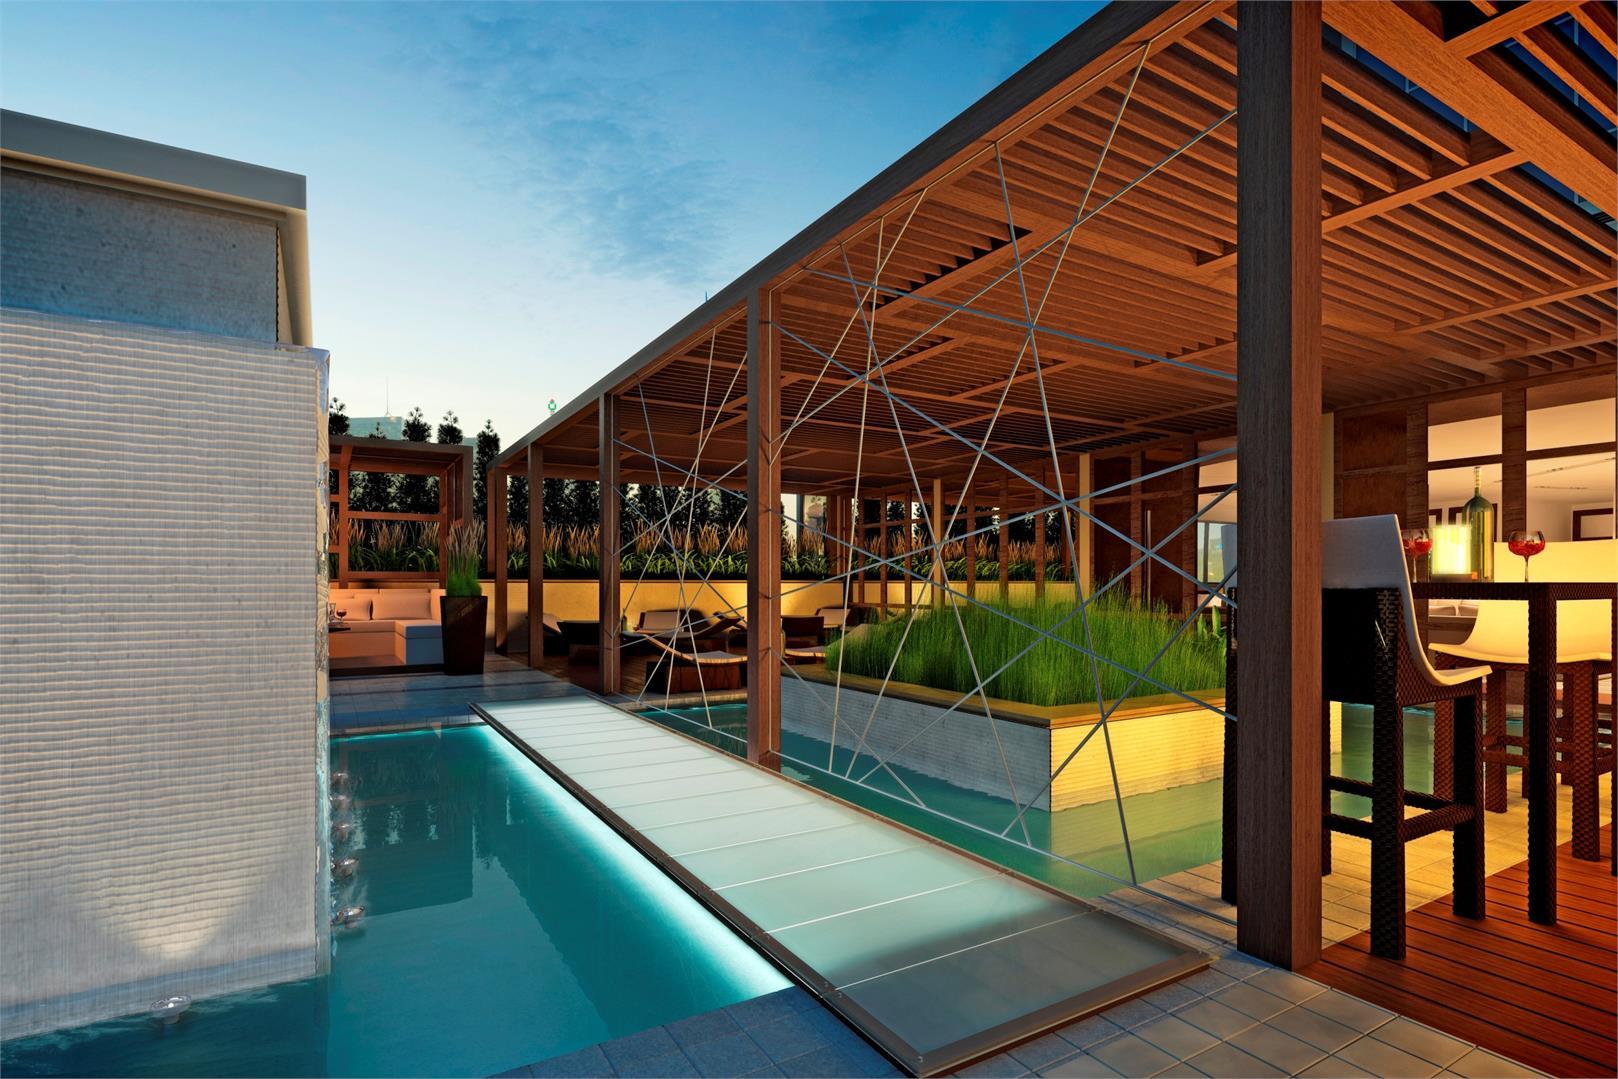 Fly Condos Terrace Pool Toronto, Canada